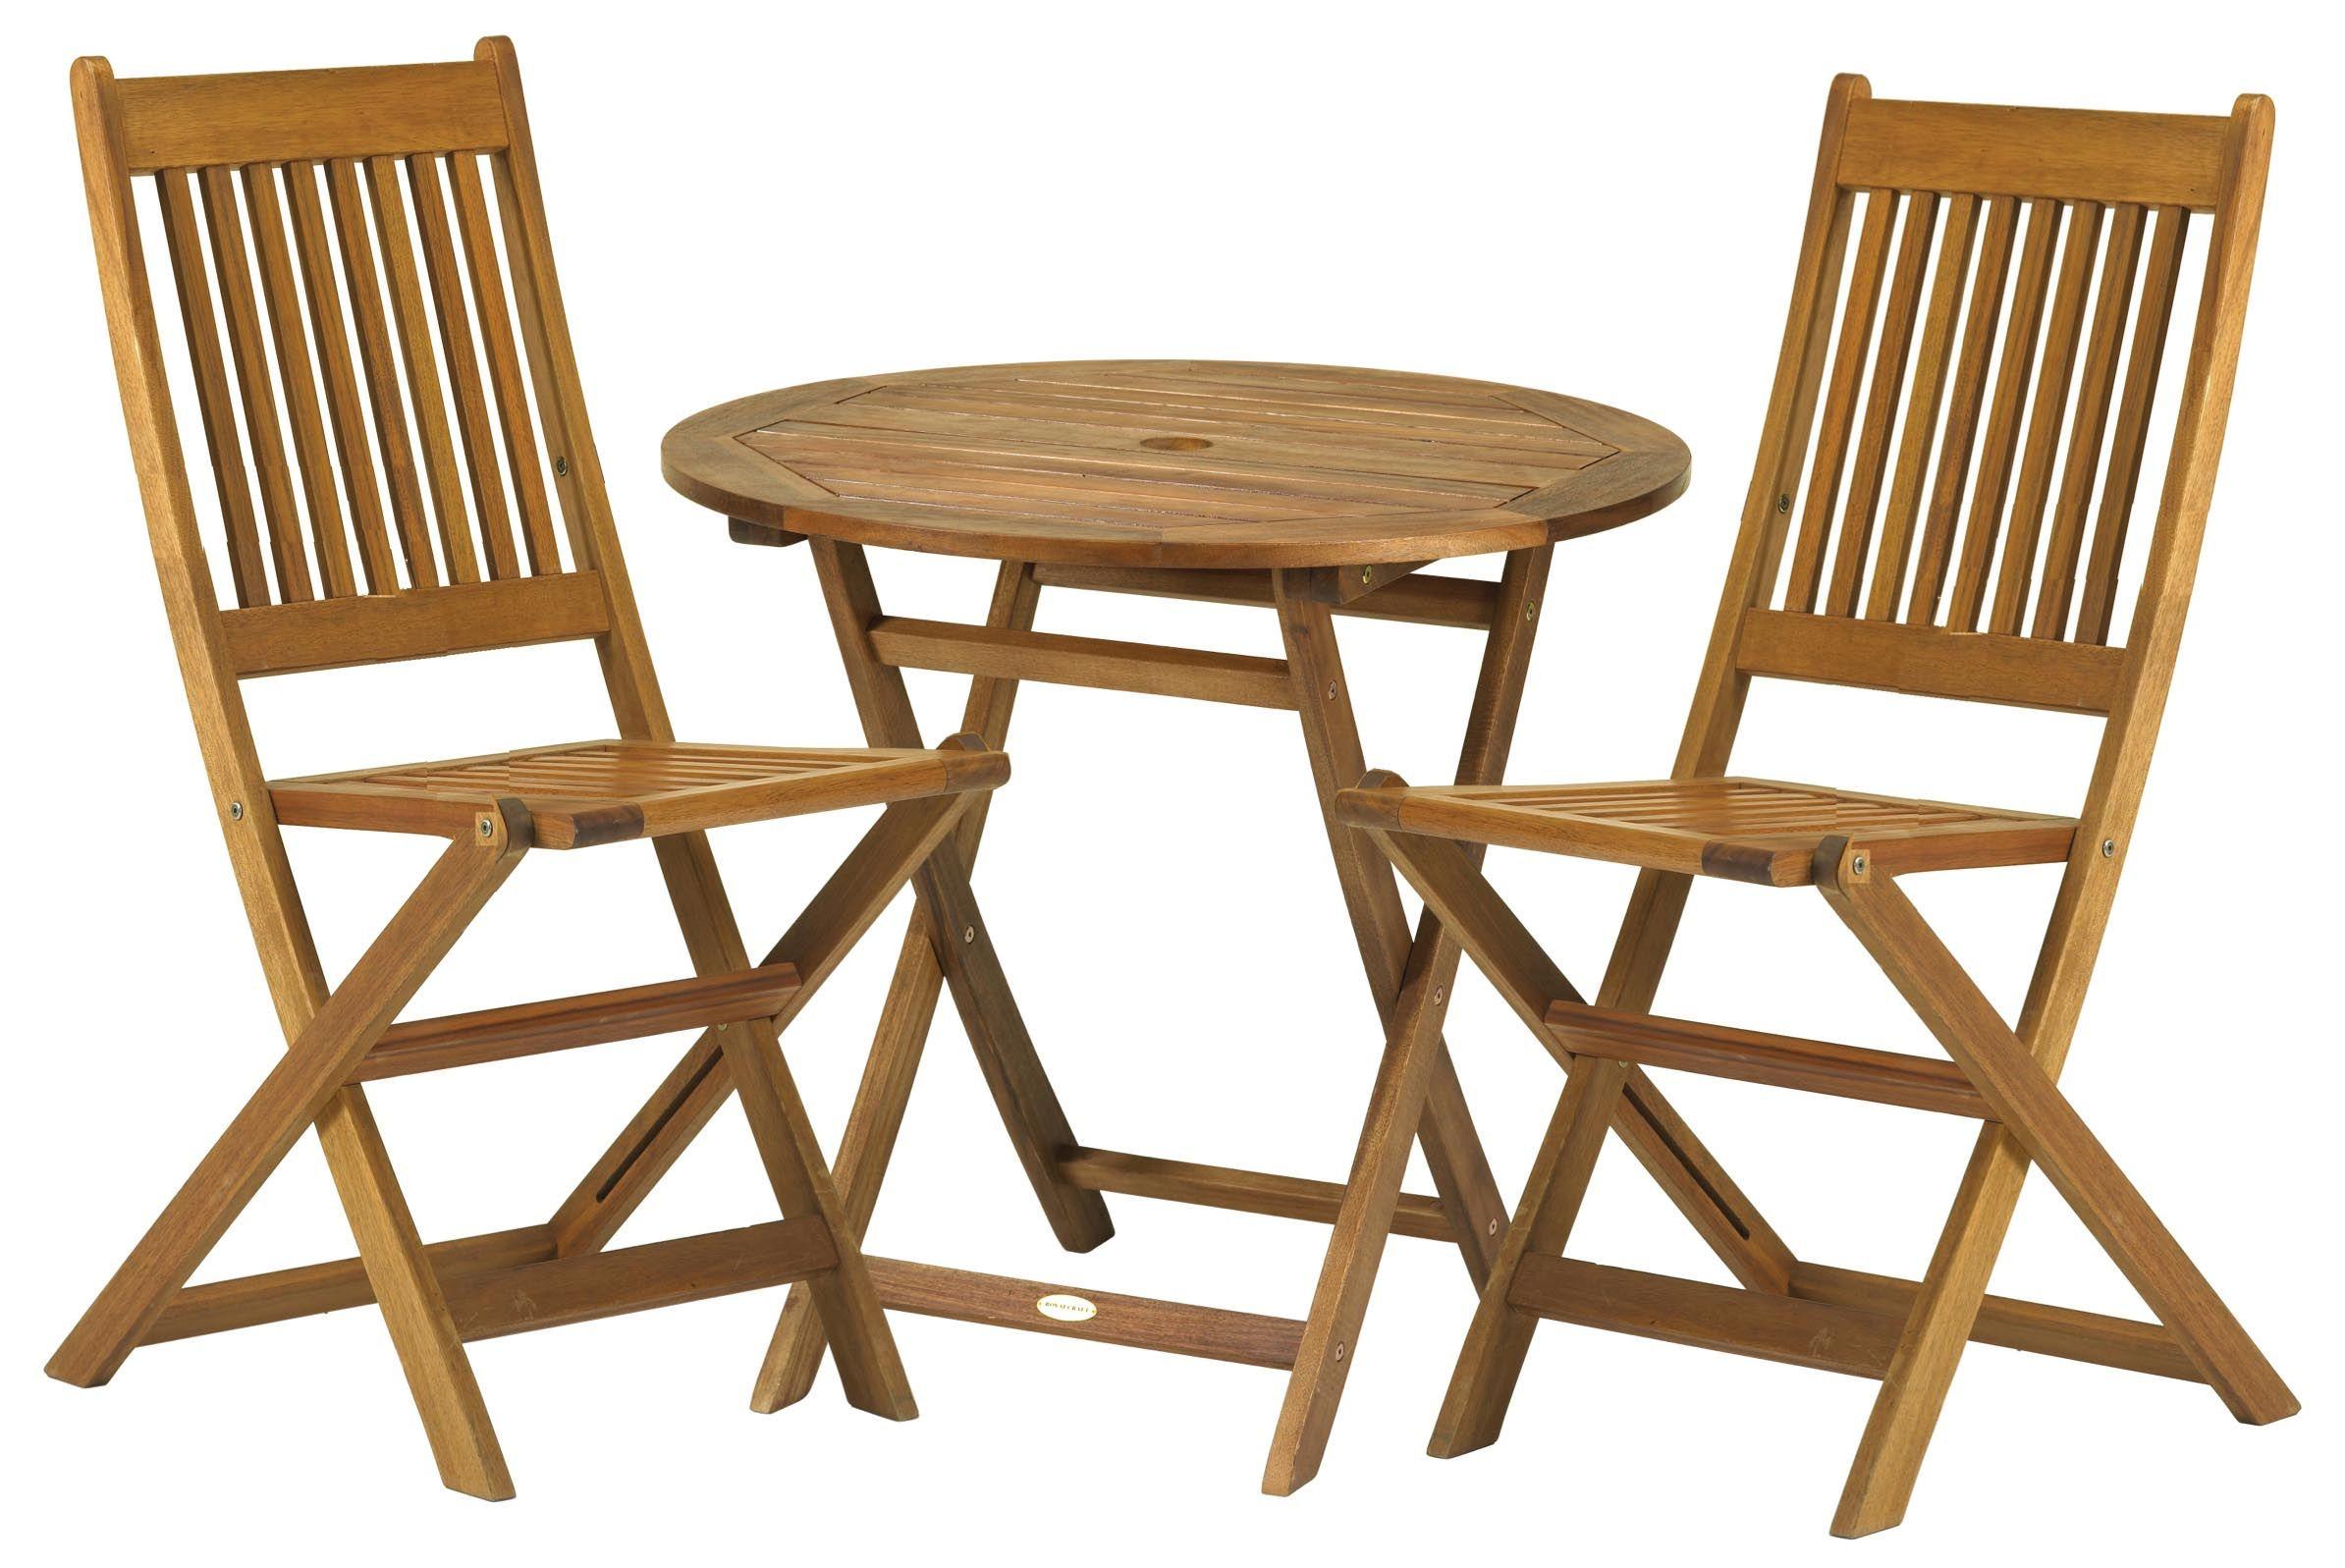 Porto 2 Seater Bistro Patio Furniture Set £119.99 Argos Shop Online ...